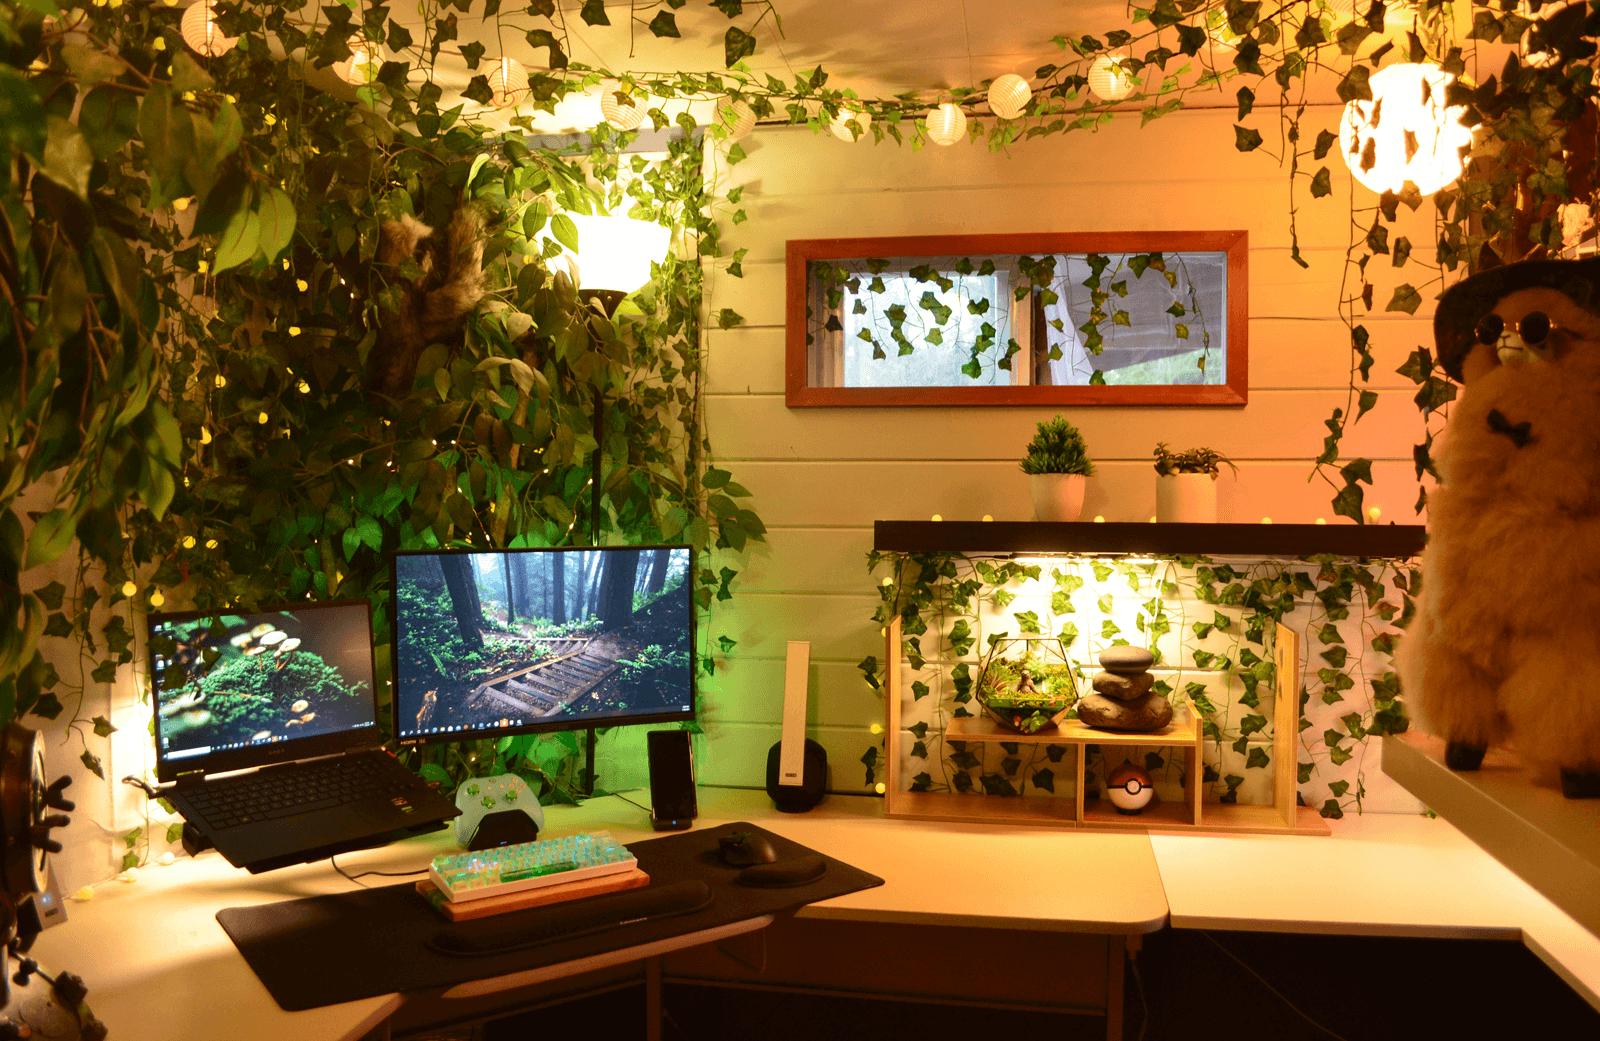 Urban Jungle home setup in Washington